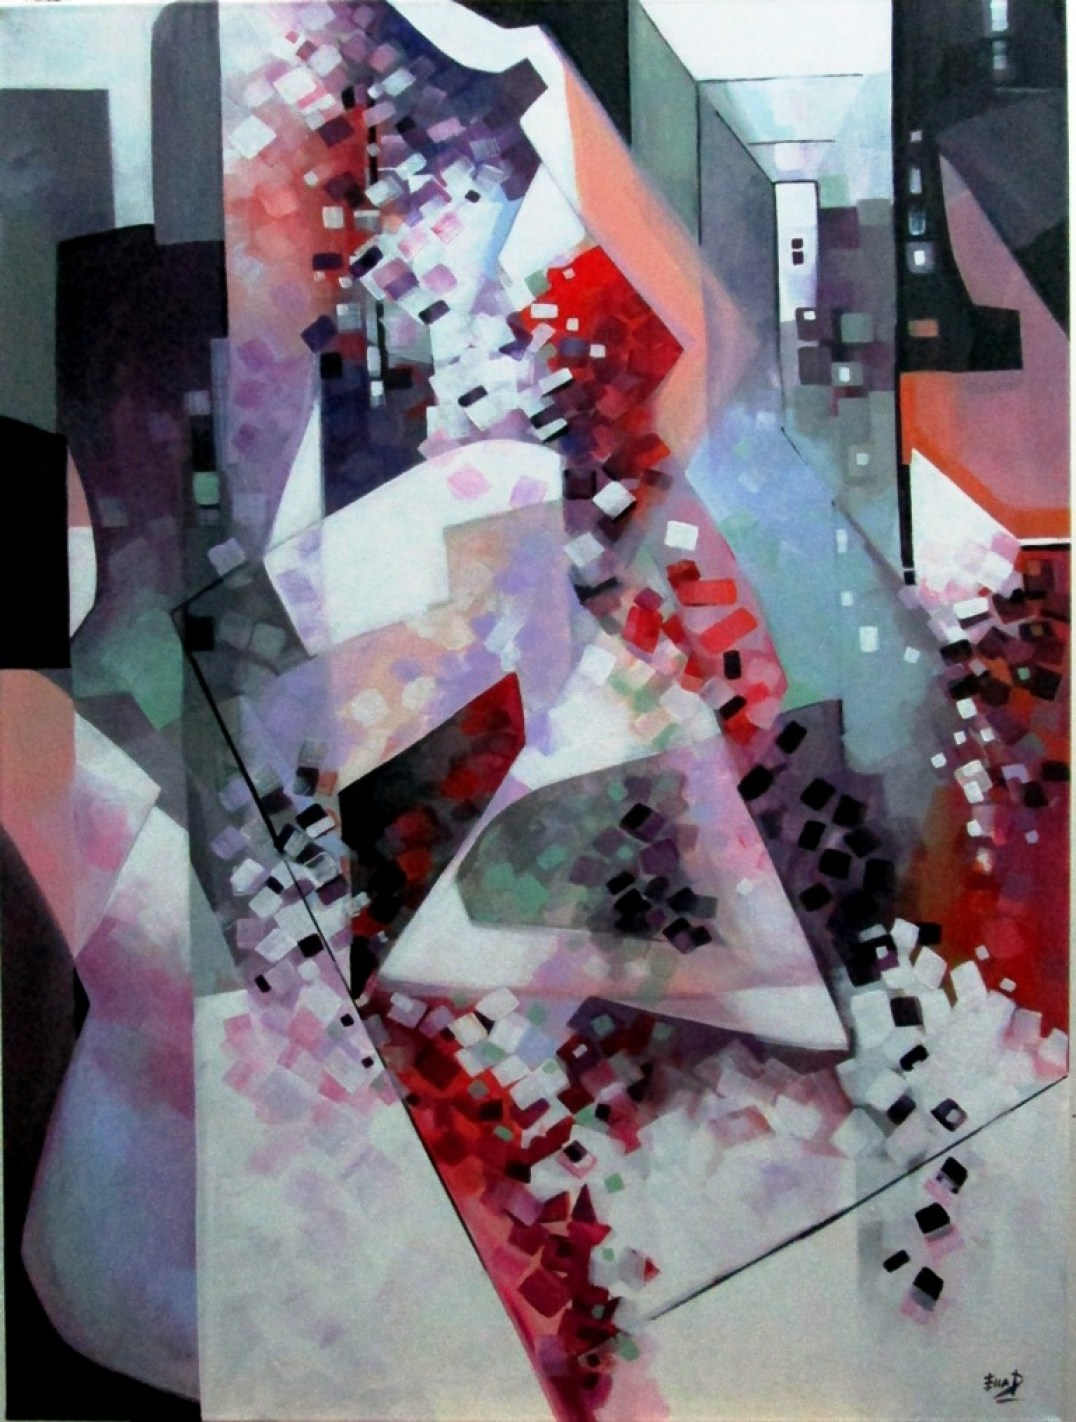 Reflections 40 x 30cm Acrylic on canvas